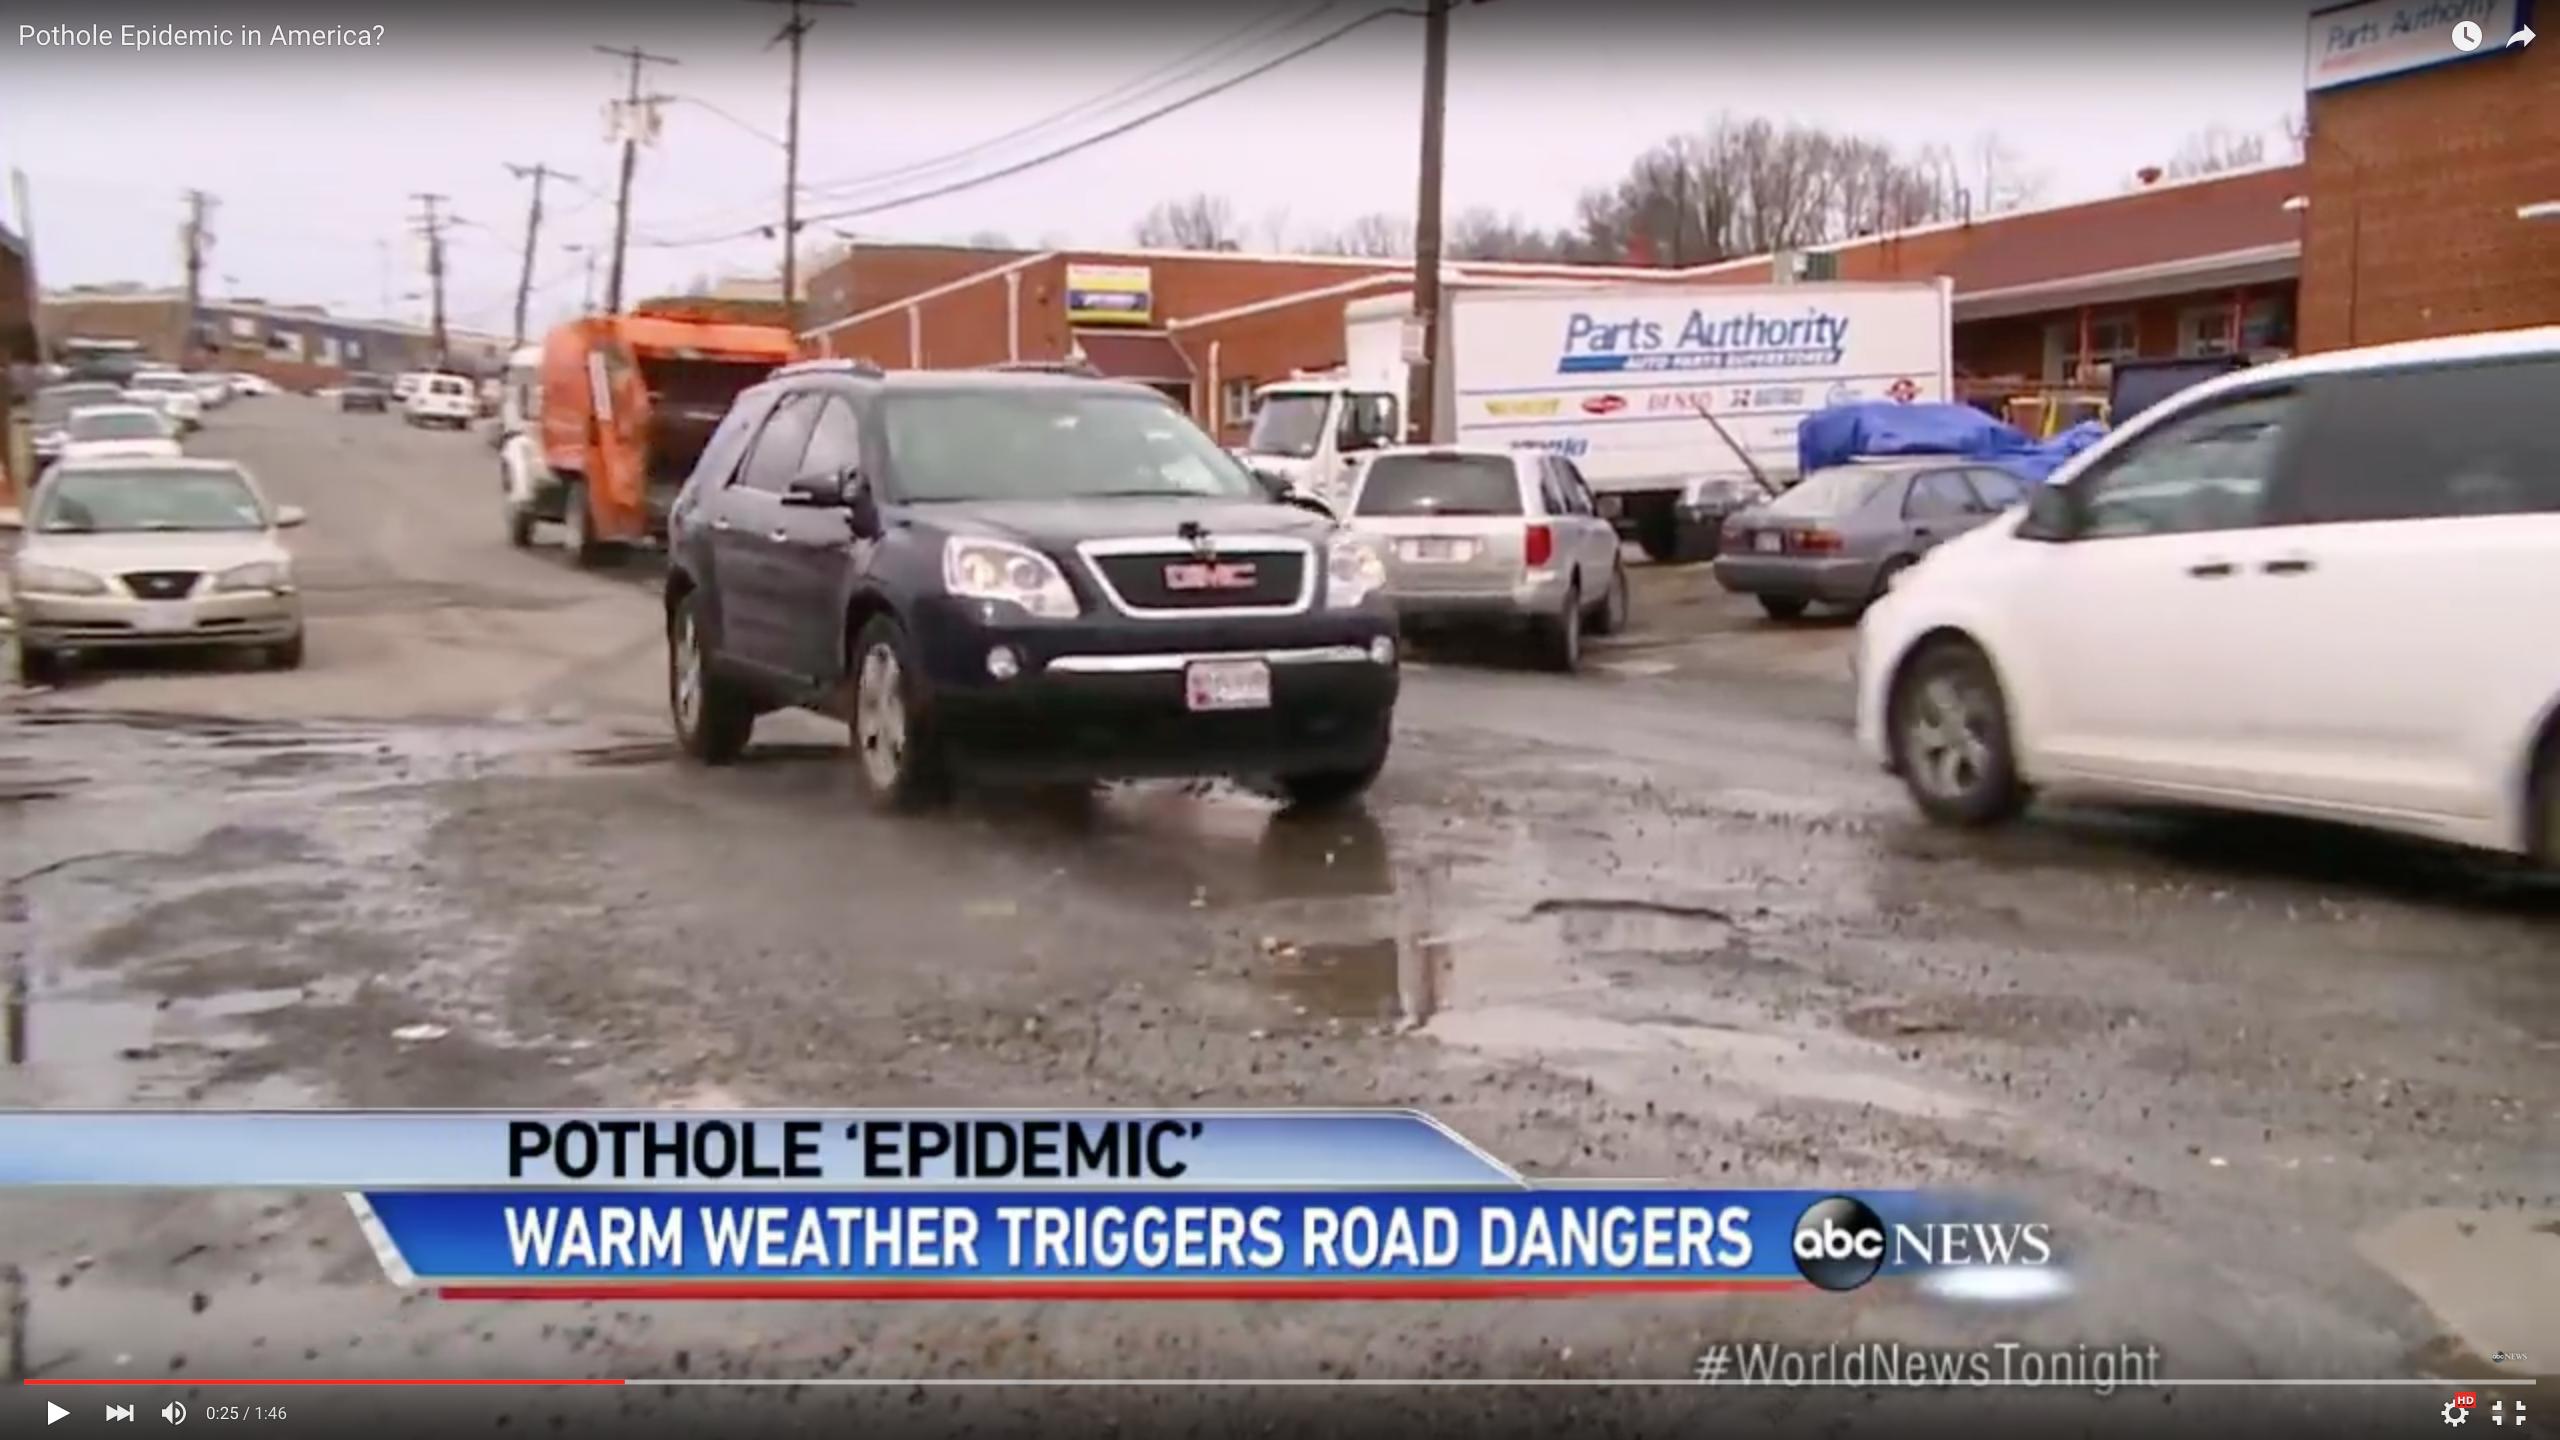 A Pothole Epidemic